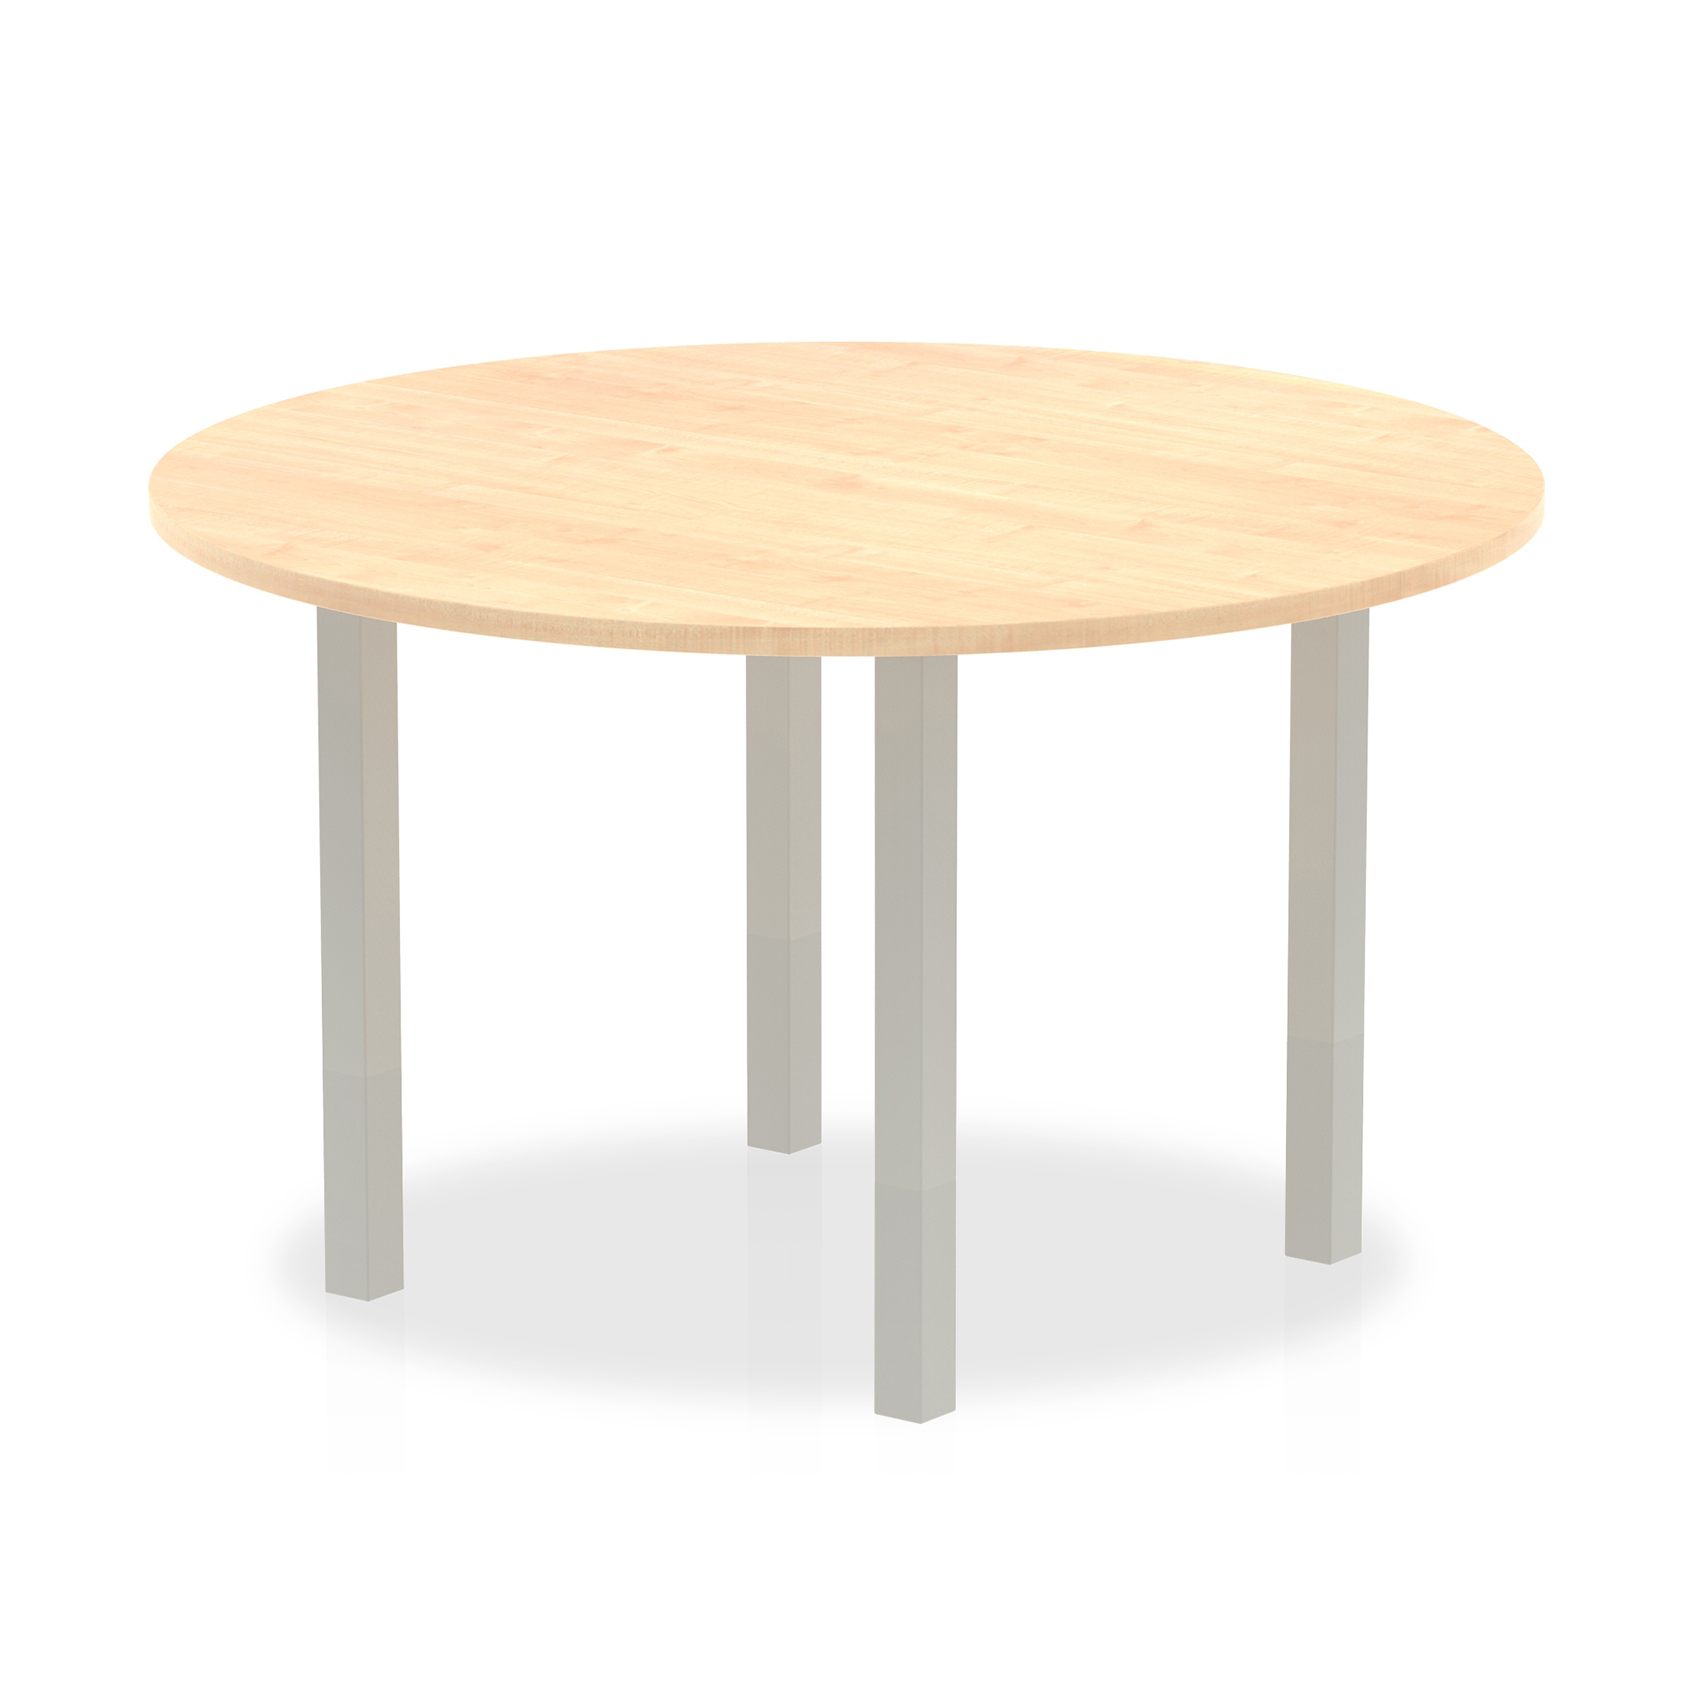 Trexus Meeting Table Round 1200mm Maple Ref I000260